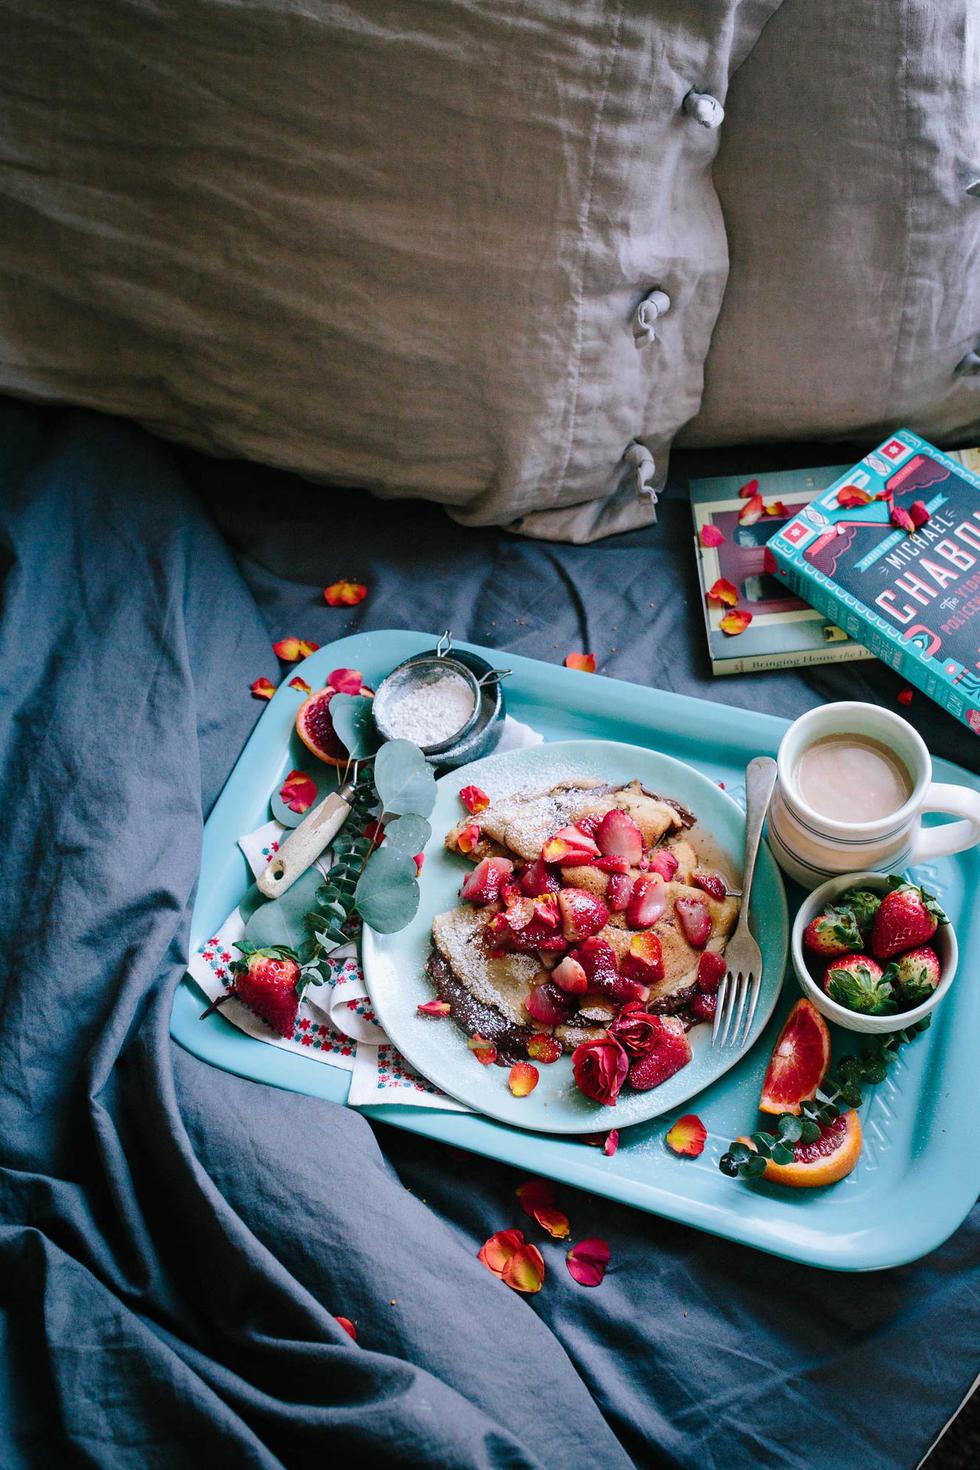 Guilt-Free Snacks You Can Binge On